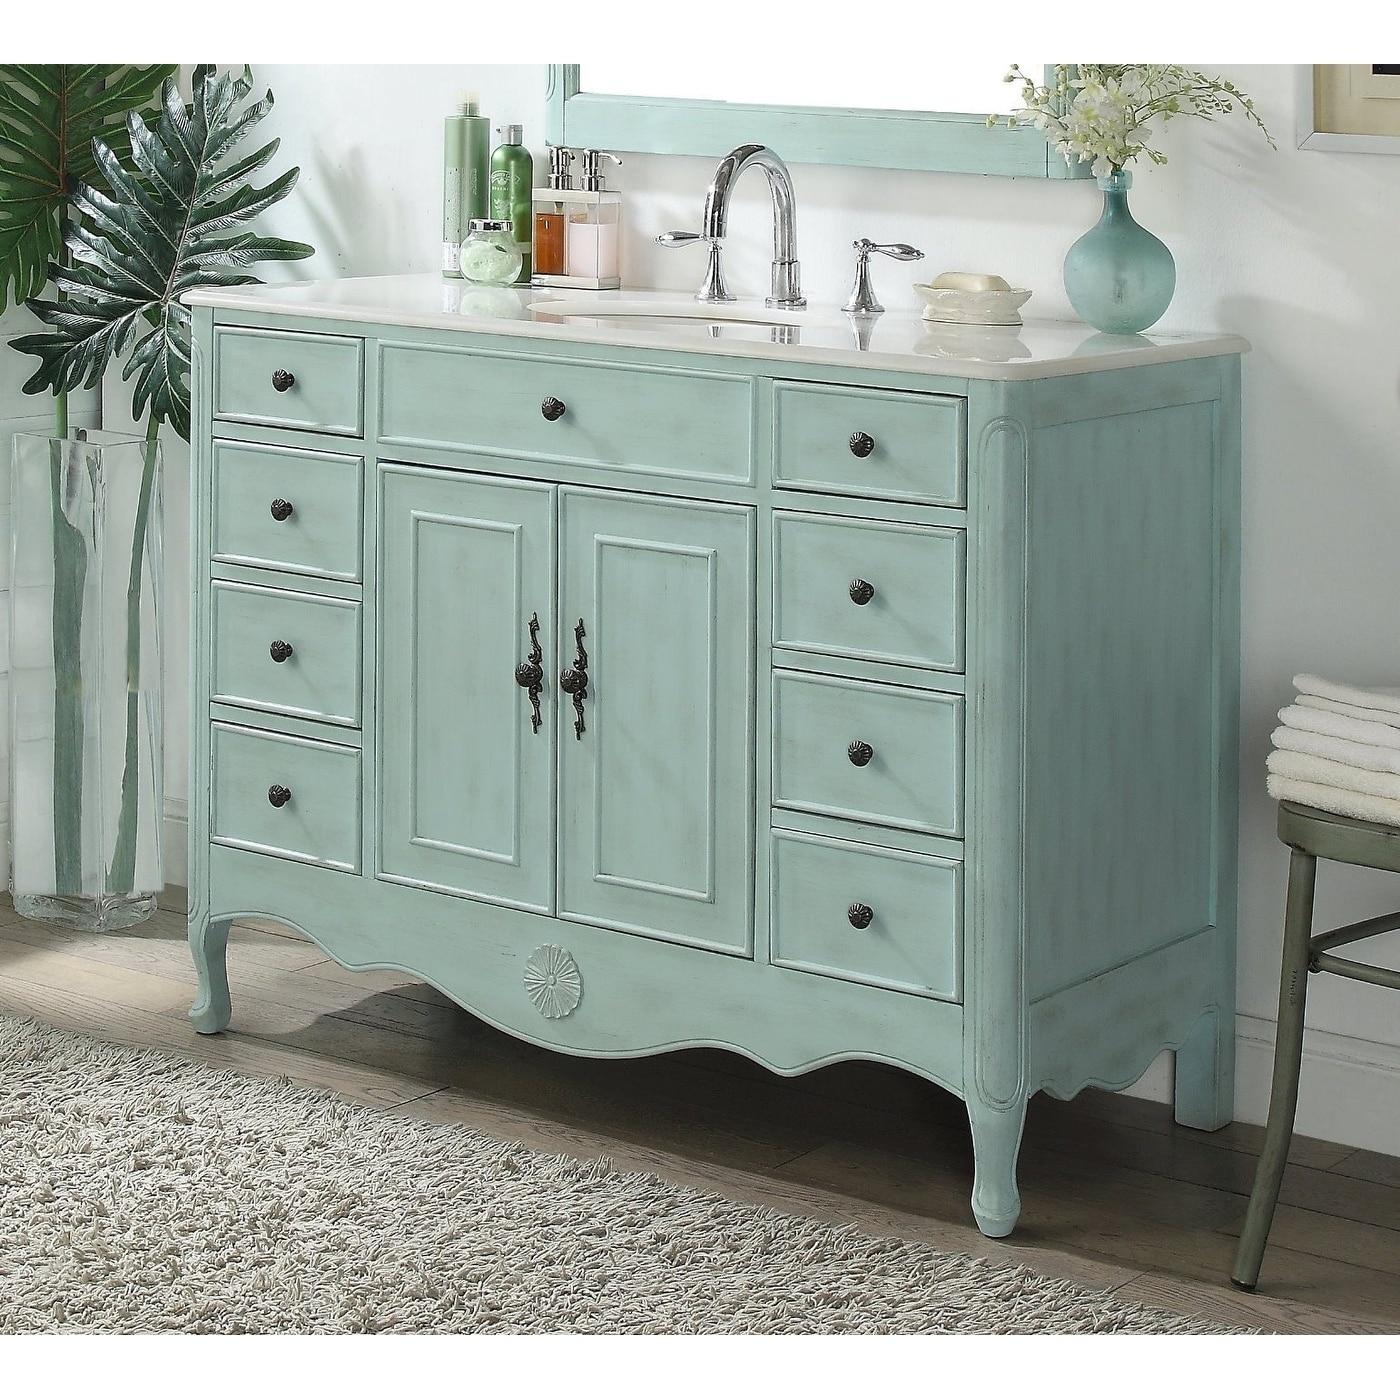 Assembled Bathroom Furniture   Find Great Furniture Deals Shopping ...